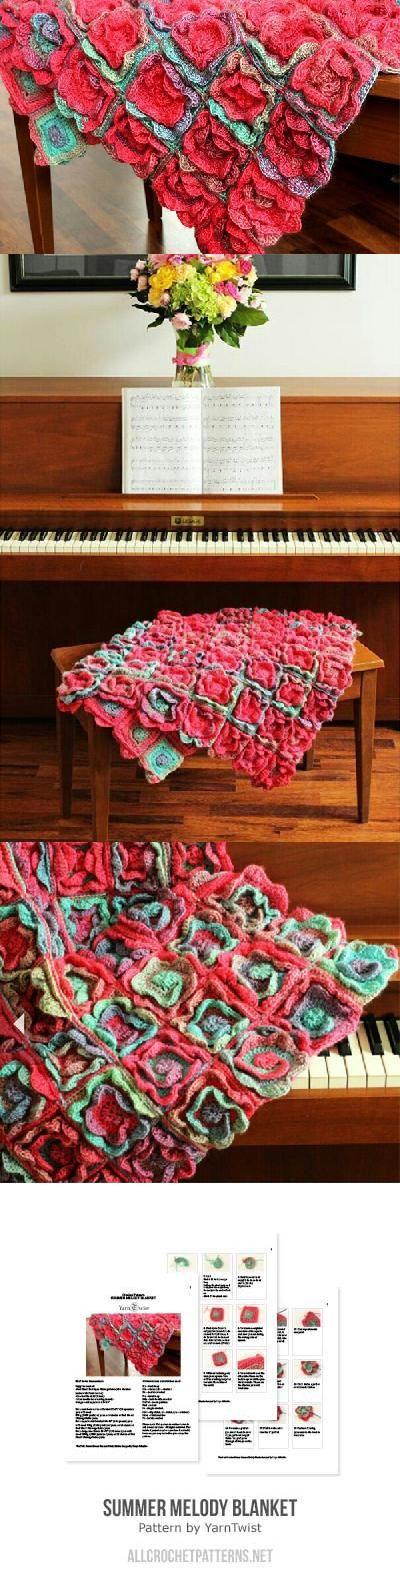 Dorable Voluminoso Crochet Hilo Patrón Chambergo Regalo - Manta de ...